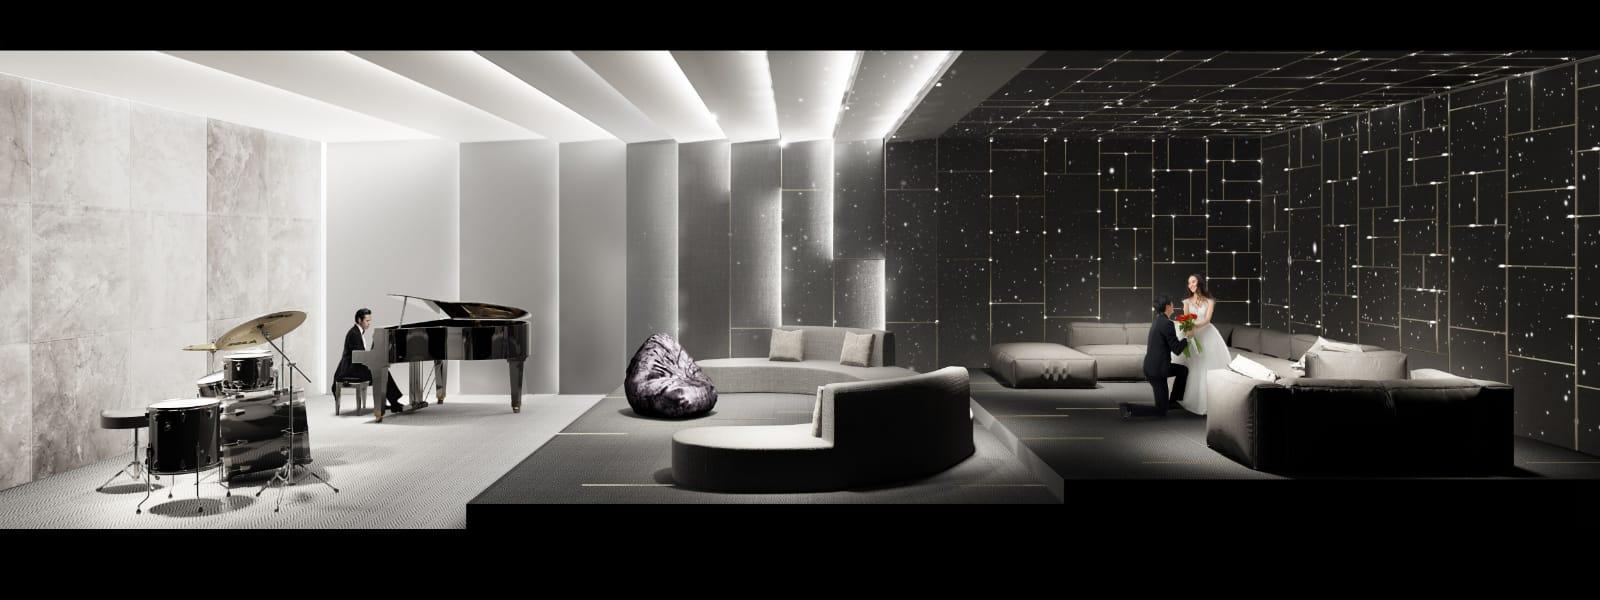 parc-clematis-music-room